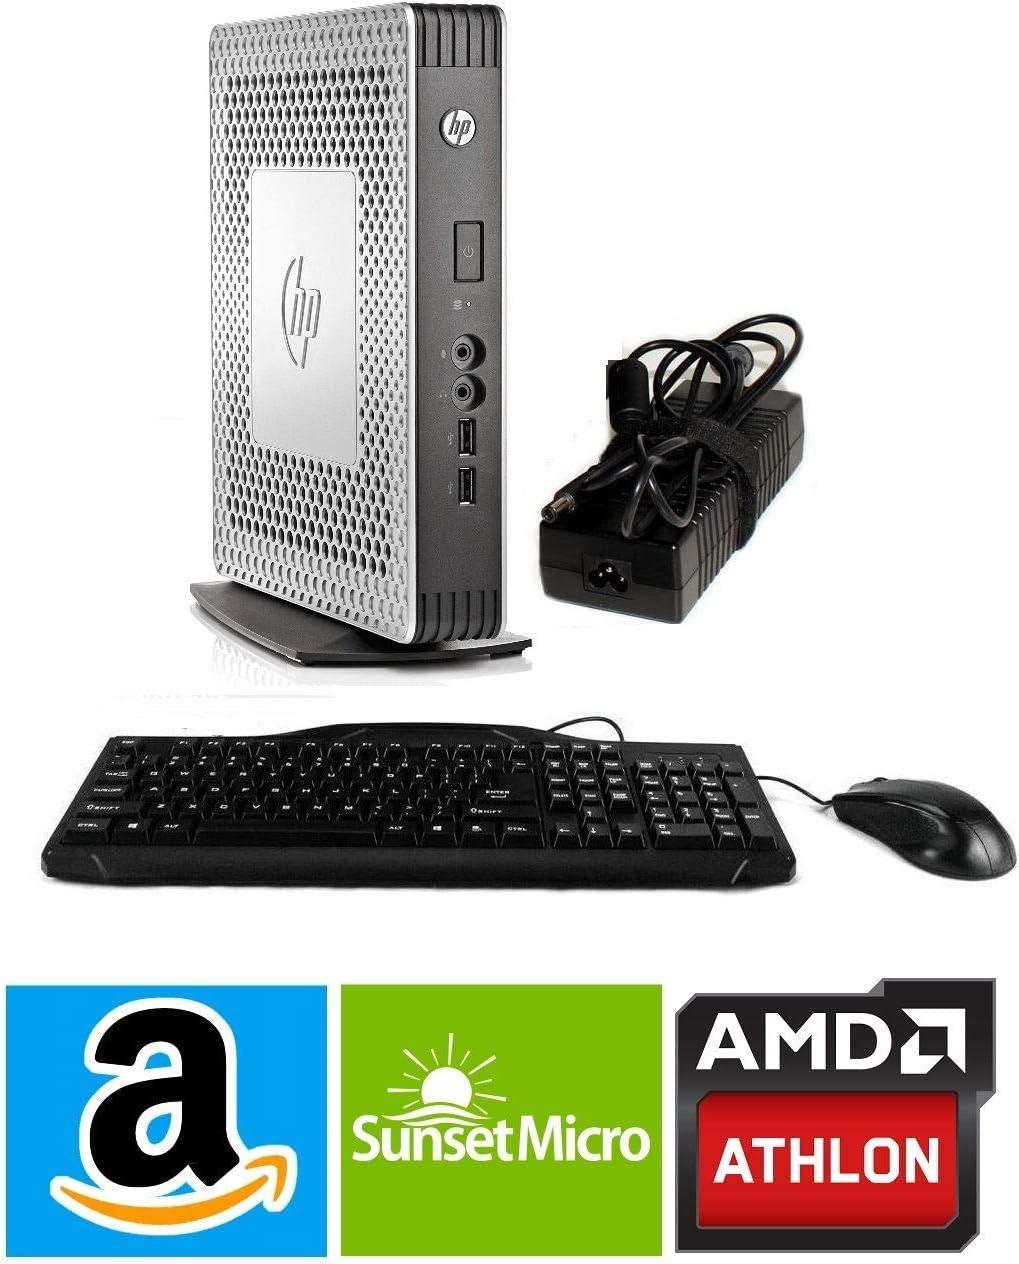 HP Thin Client T610 E4T92AA#ABA AMD Dual CORE T-56N 1.65 GHZ, 1GB Flash, 4GB DDR3-1600 SODIM